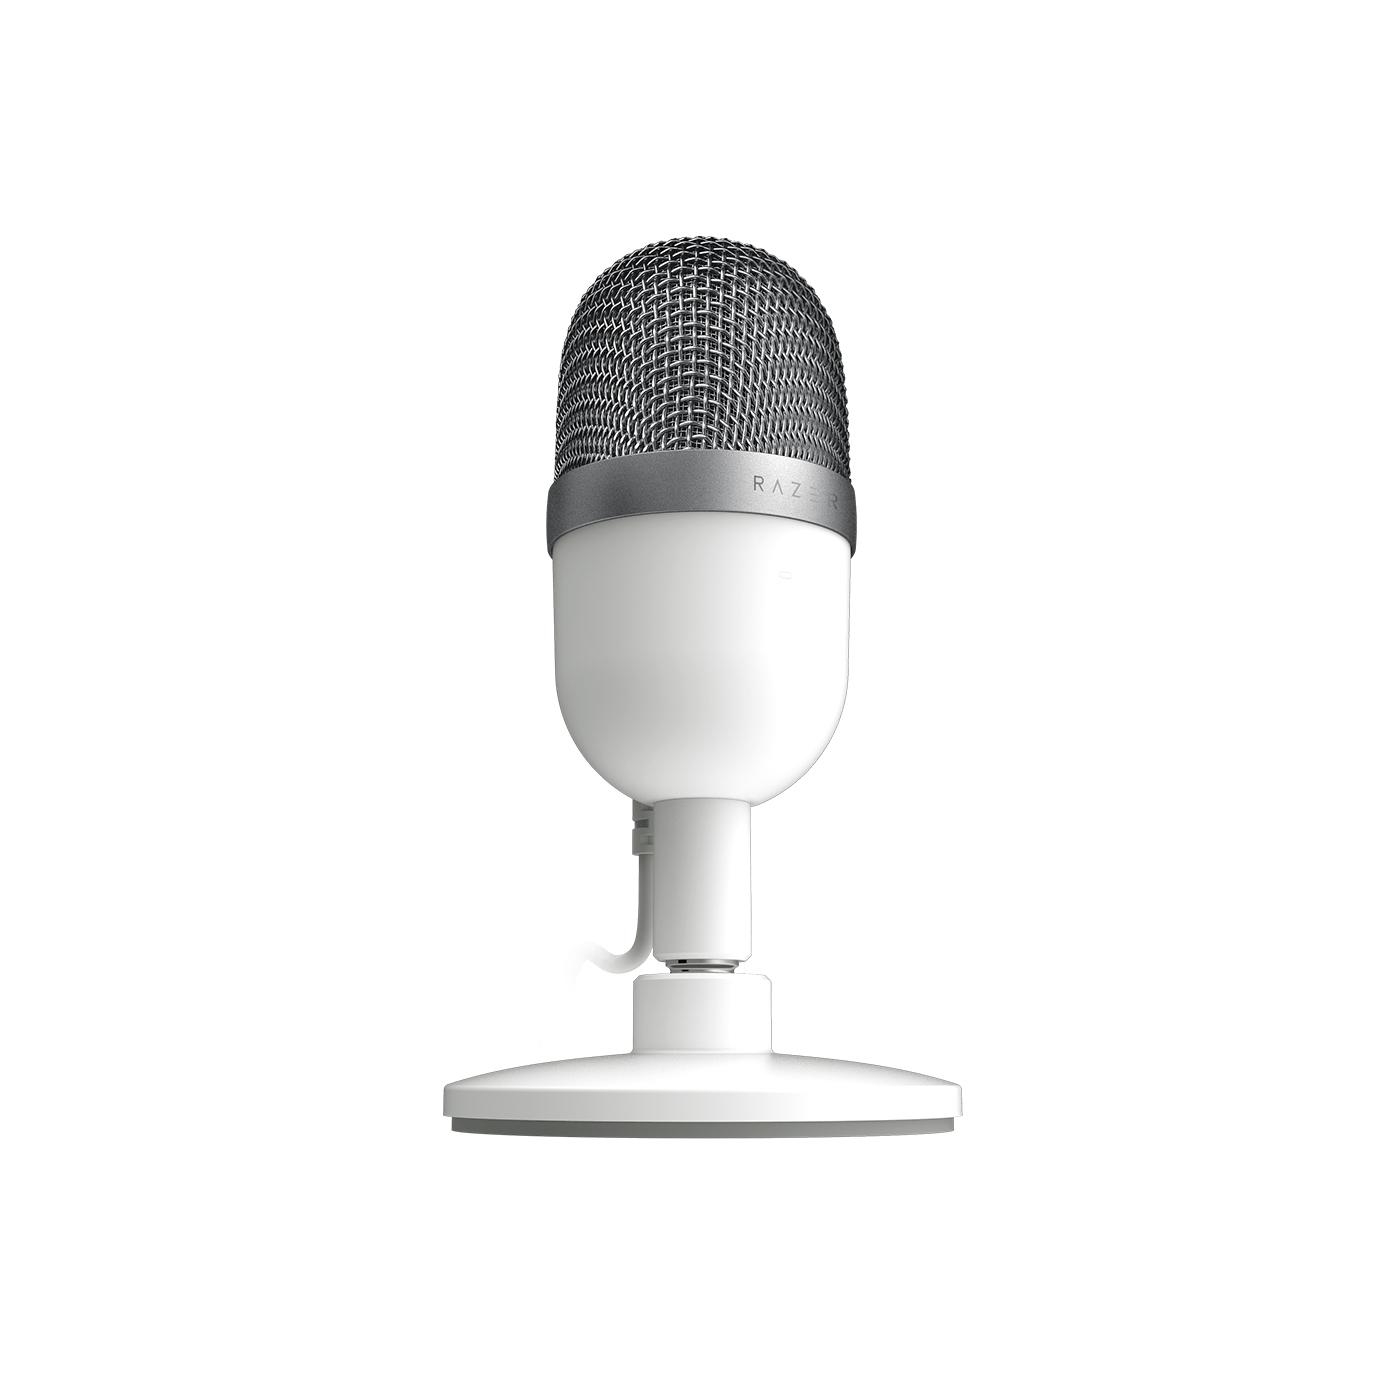 Razer SEIREN MINI MERCURY PC/PS4/PS5/MAC USB Microphone with Shockmount - Razer 1.28.80.26.159